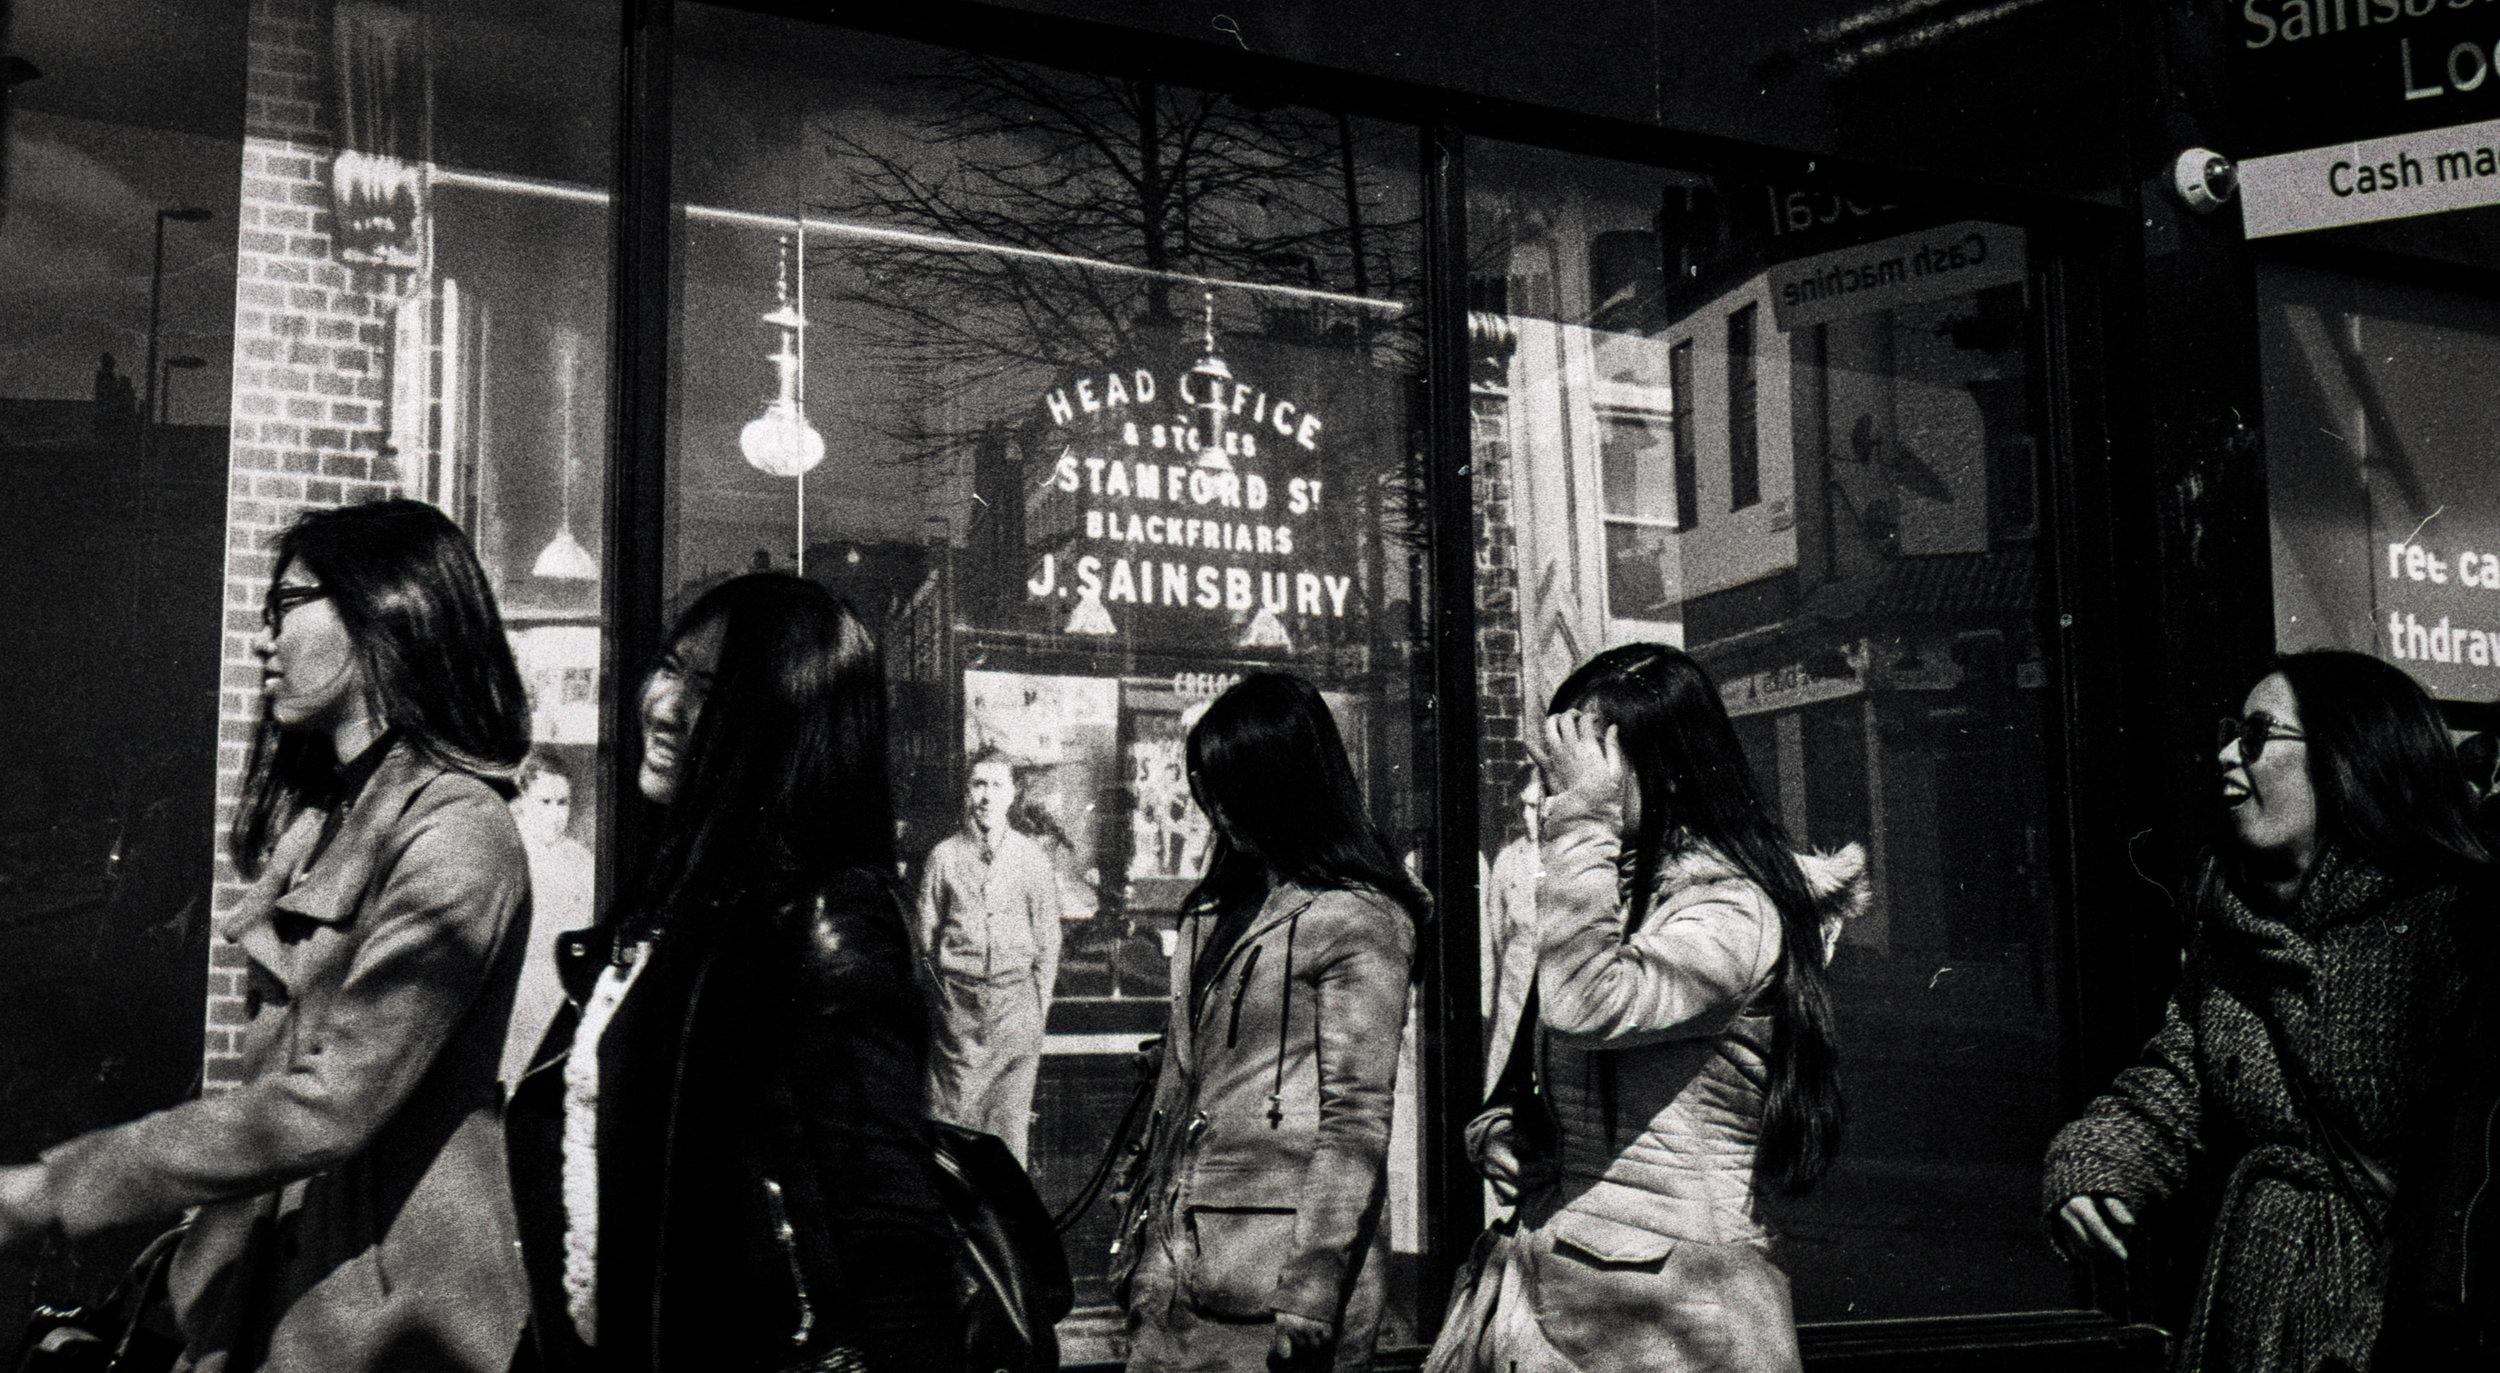 Leica_Girls_2015_3600 (2)-2.jpg